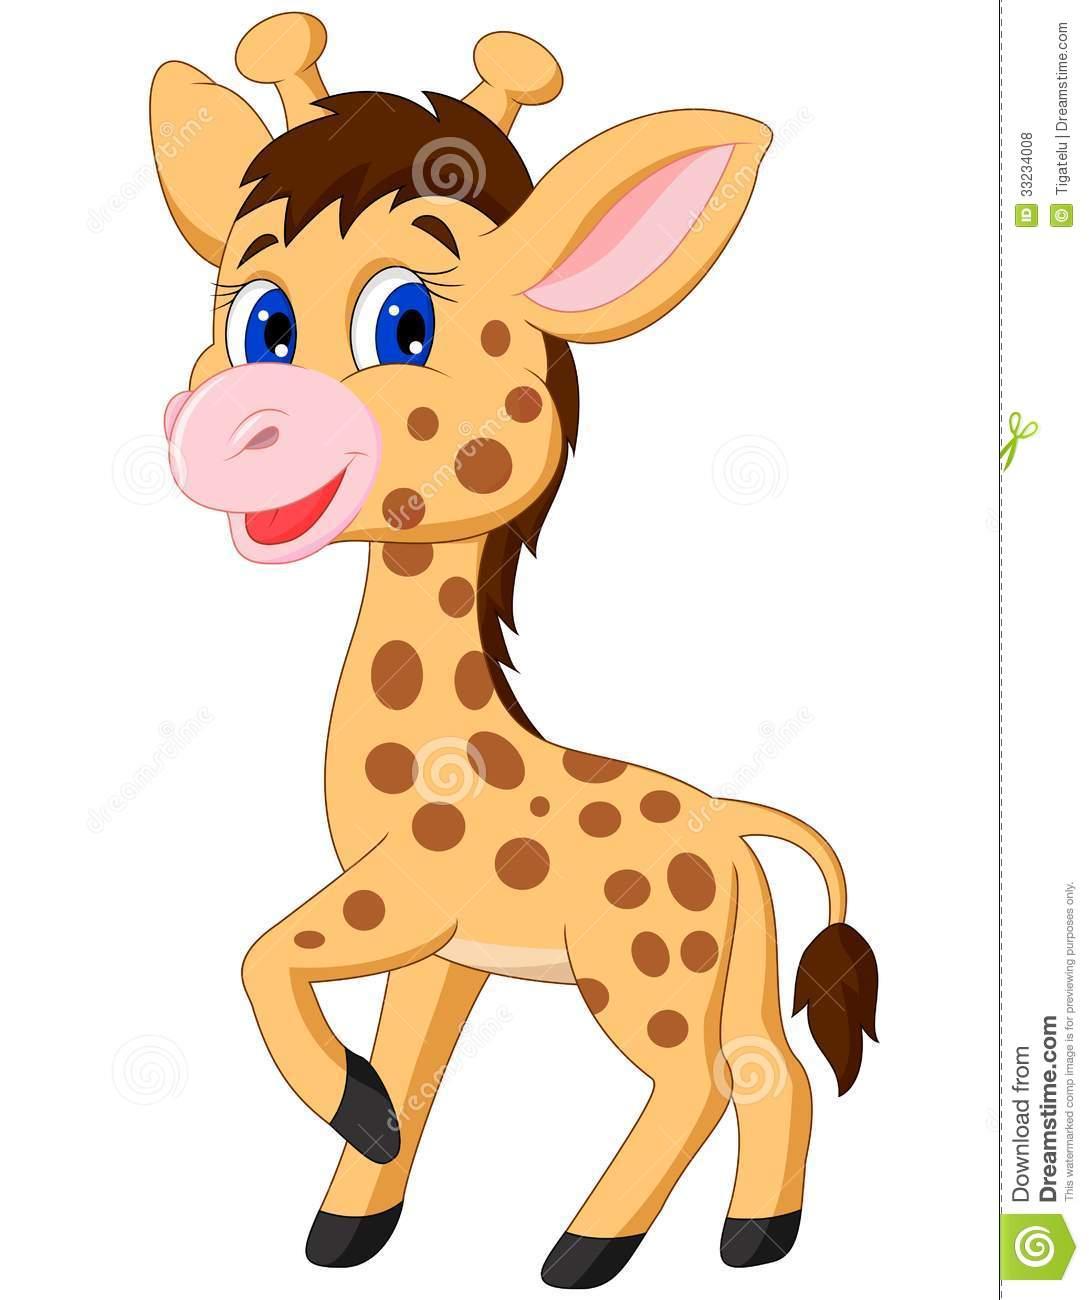 1089x1300 Cute Baby Giraffe Clipart